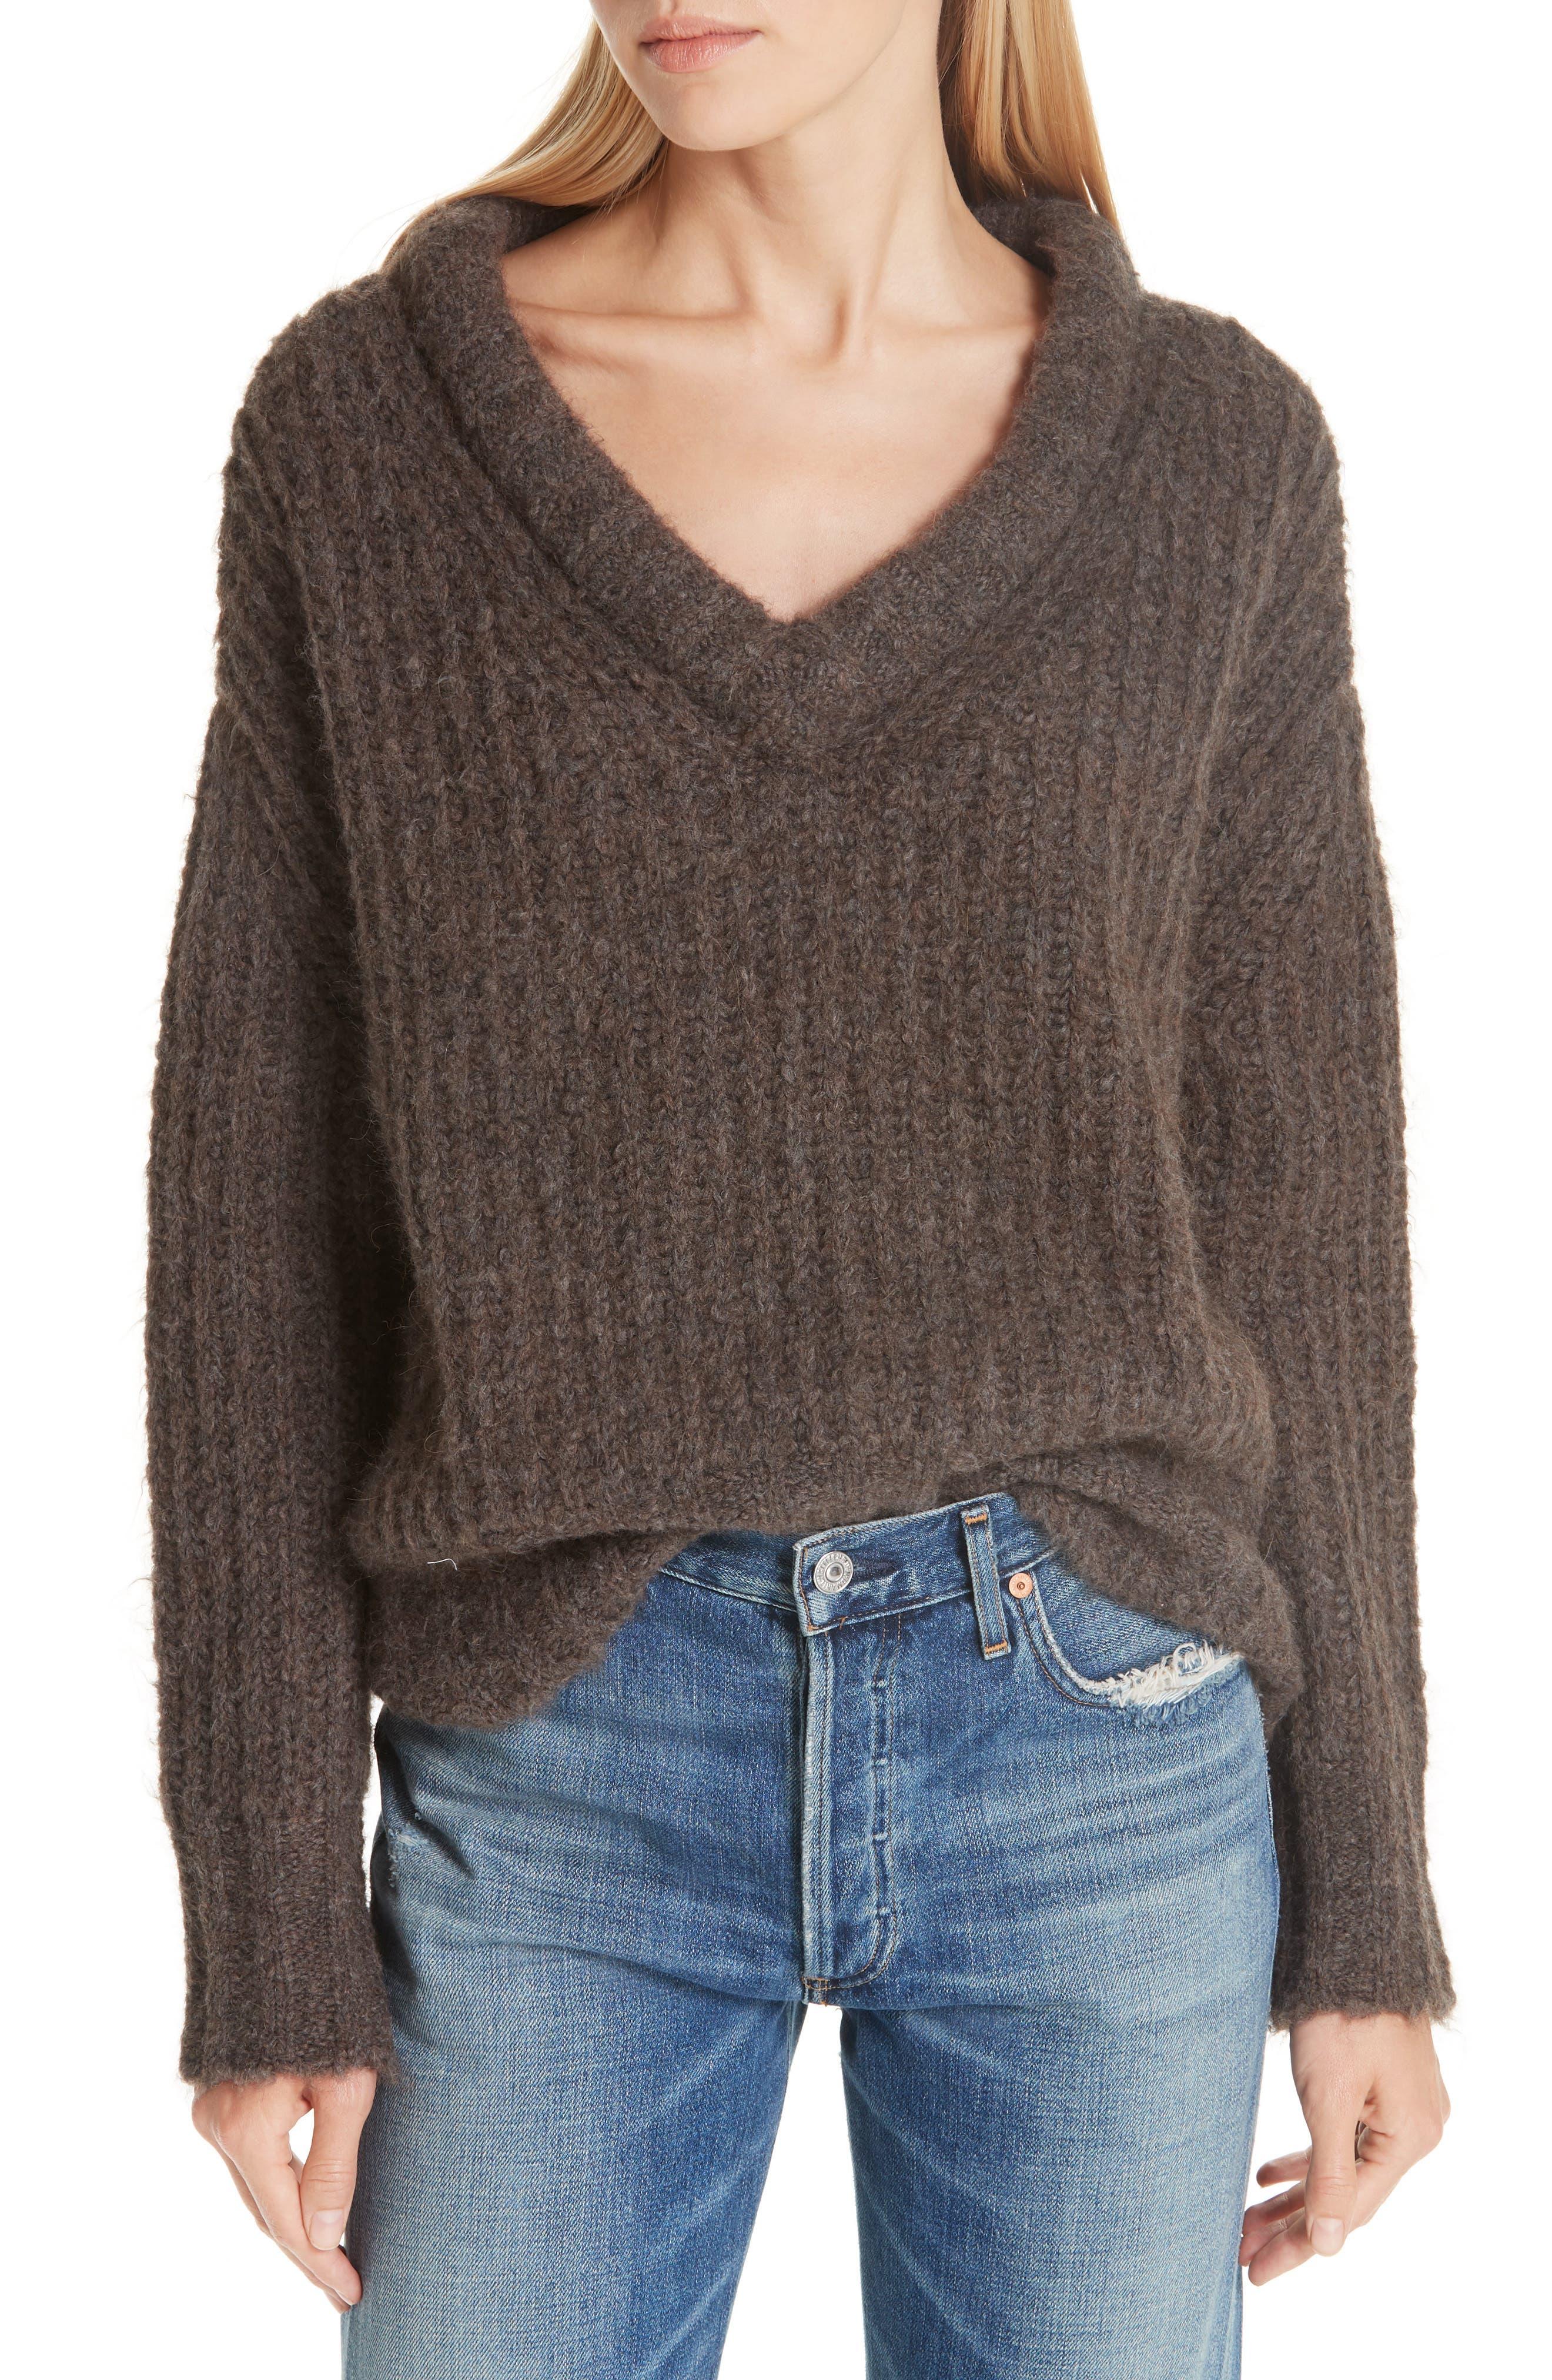 Fabiana Boxy Sweater,                         Main,                         color, 230